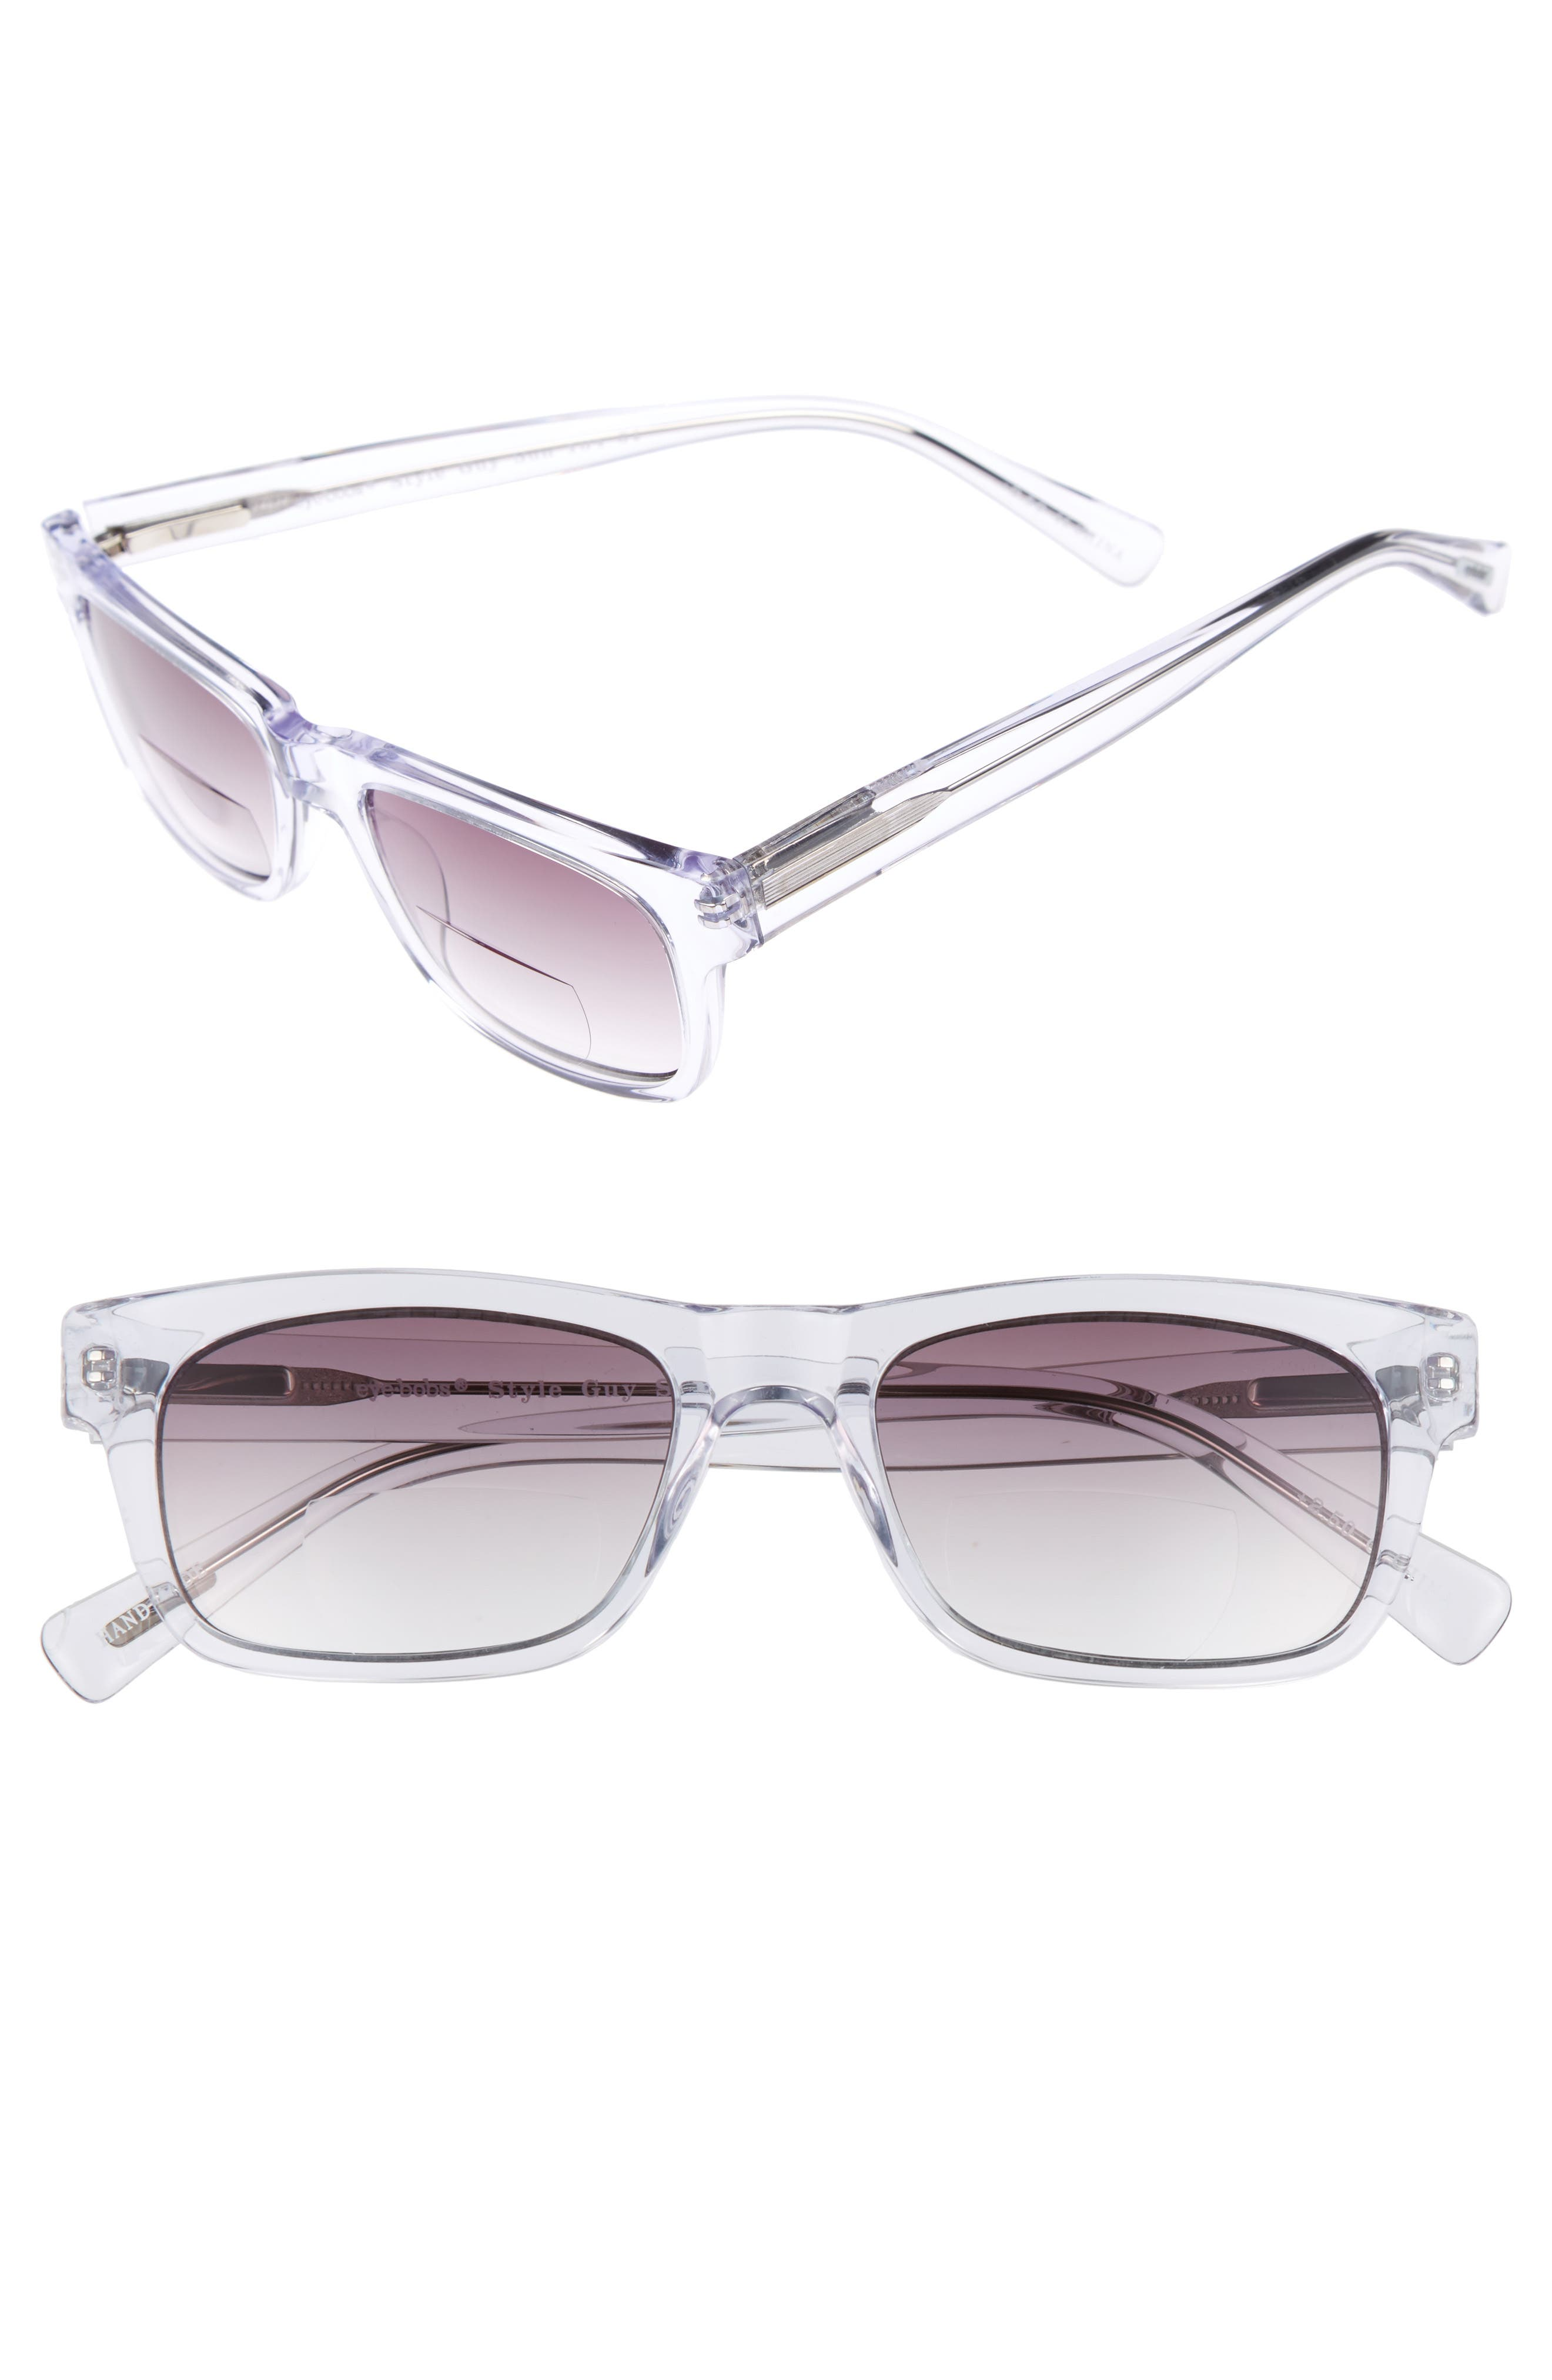 Style Guy Sun Reader 52mm Reading Sunglasses,                             Main thumbnail 1, color,                             160